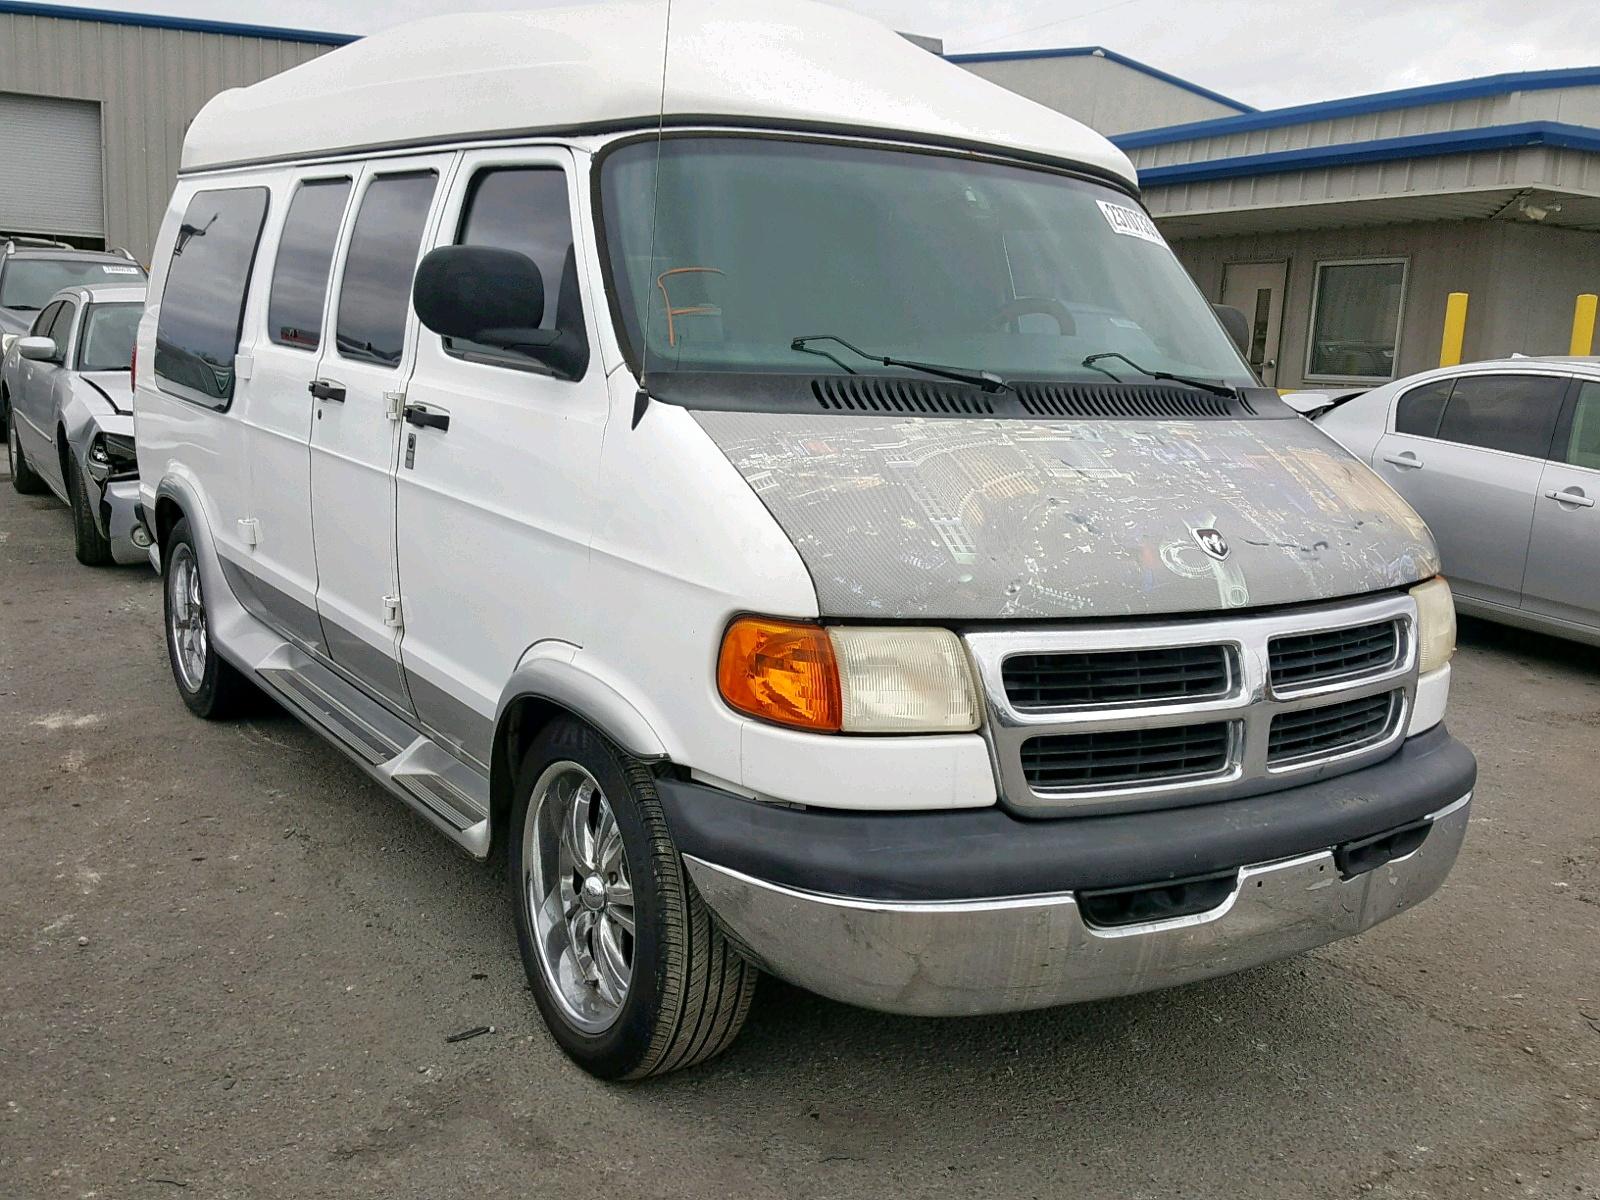 cada1d8821 1998 Dodge Ram Van B1 5.9L 8 for Sale NV - Las Vegas VIN  2B6HB11Z9WK136400